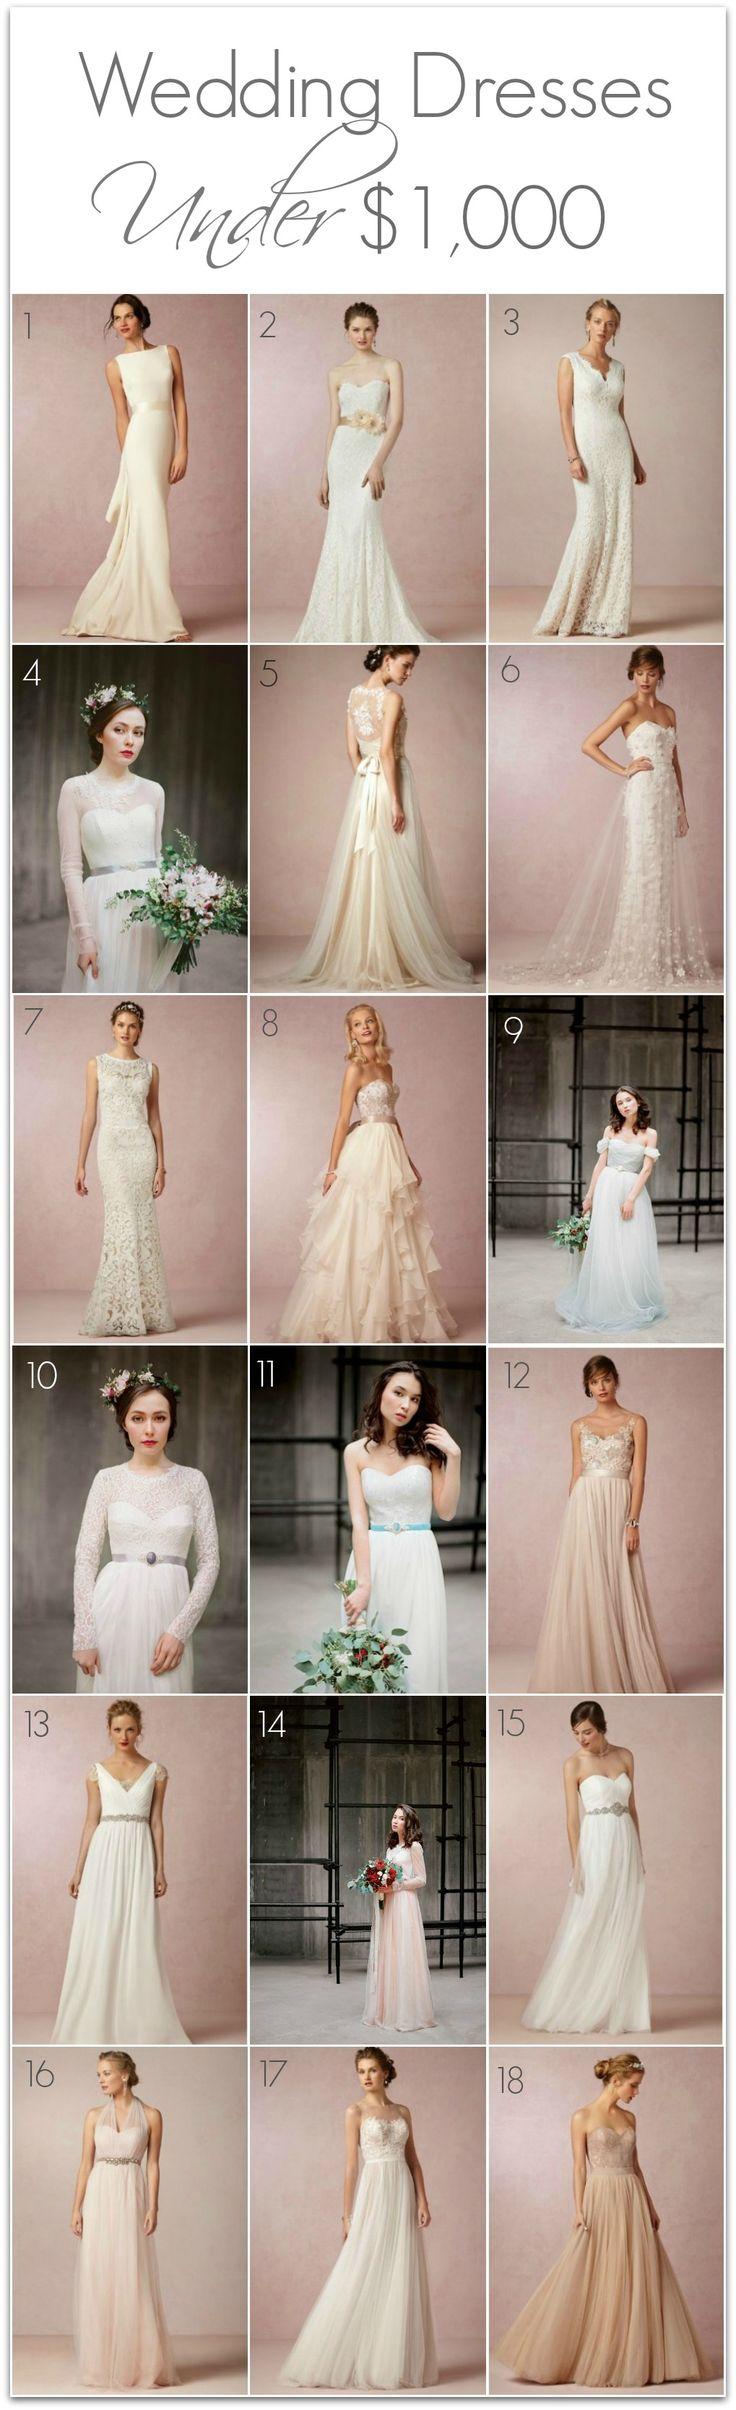 Wedding Dresses Under a thousand dollars.